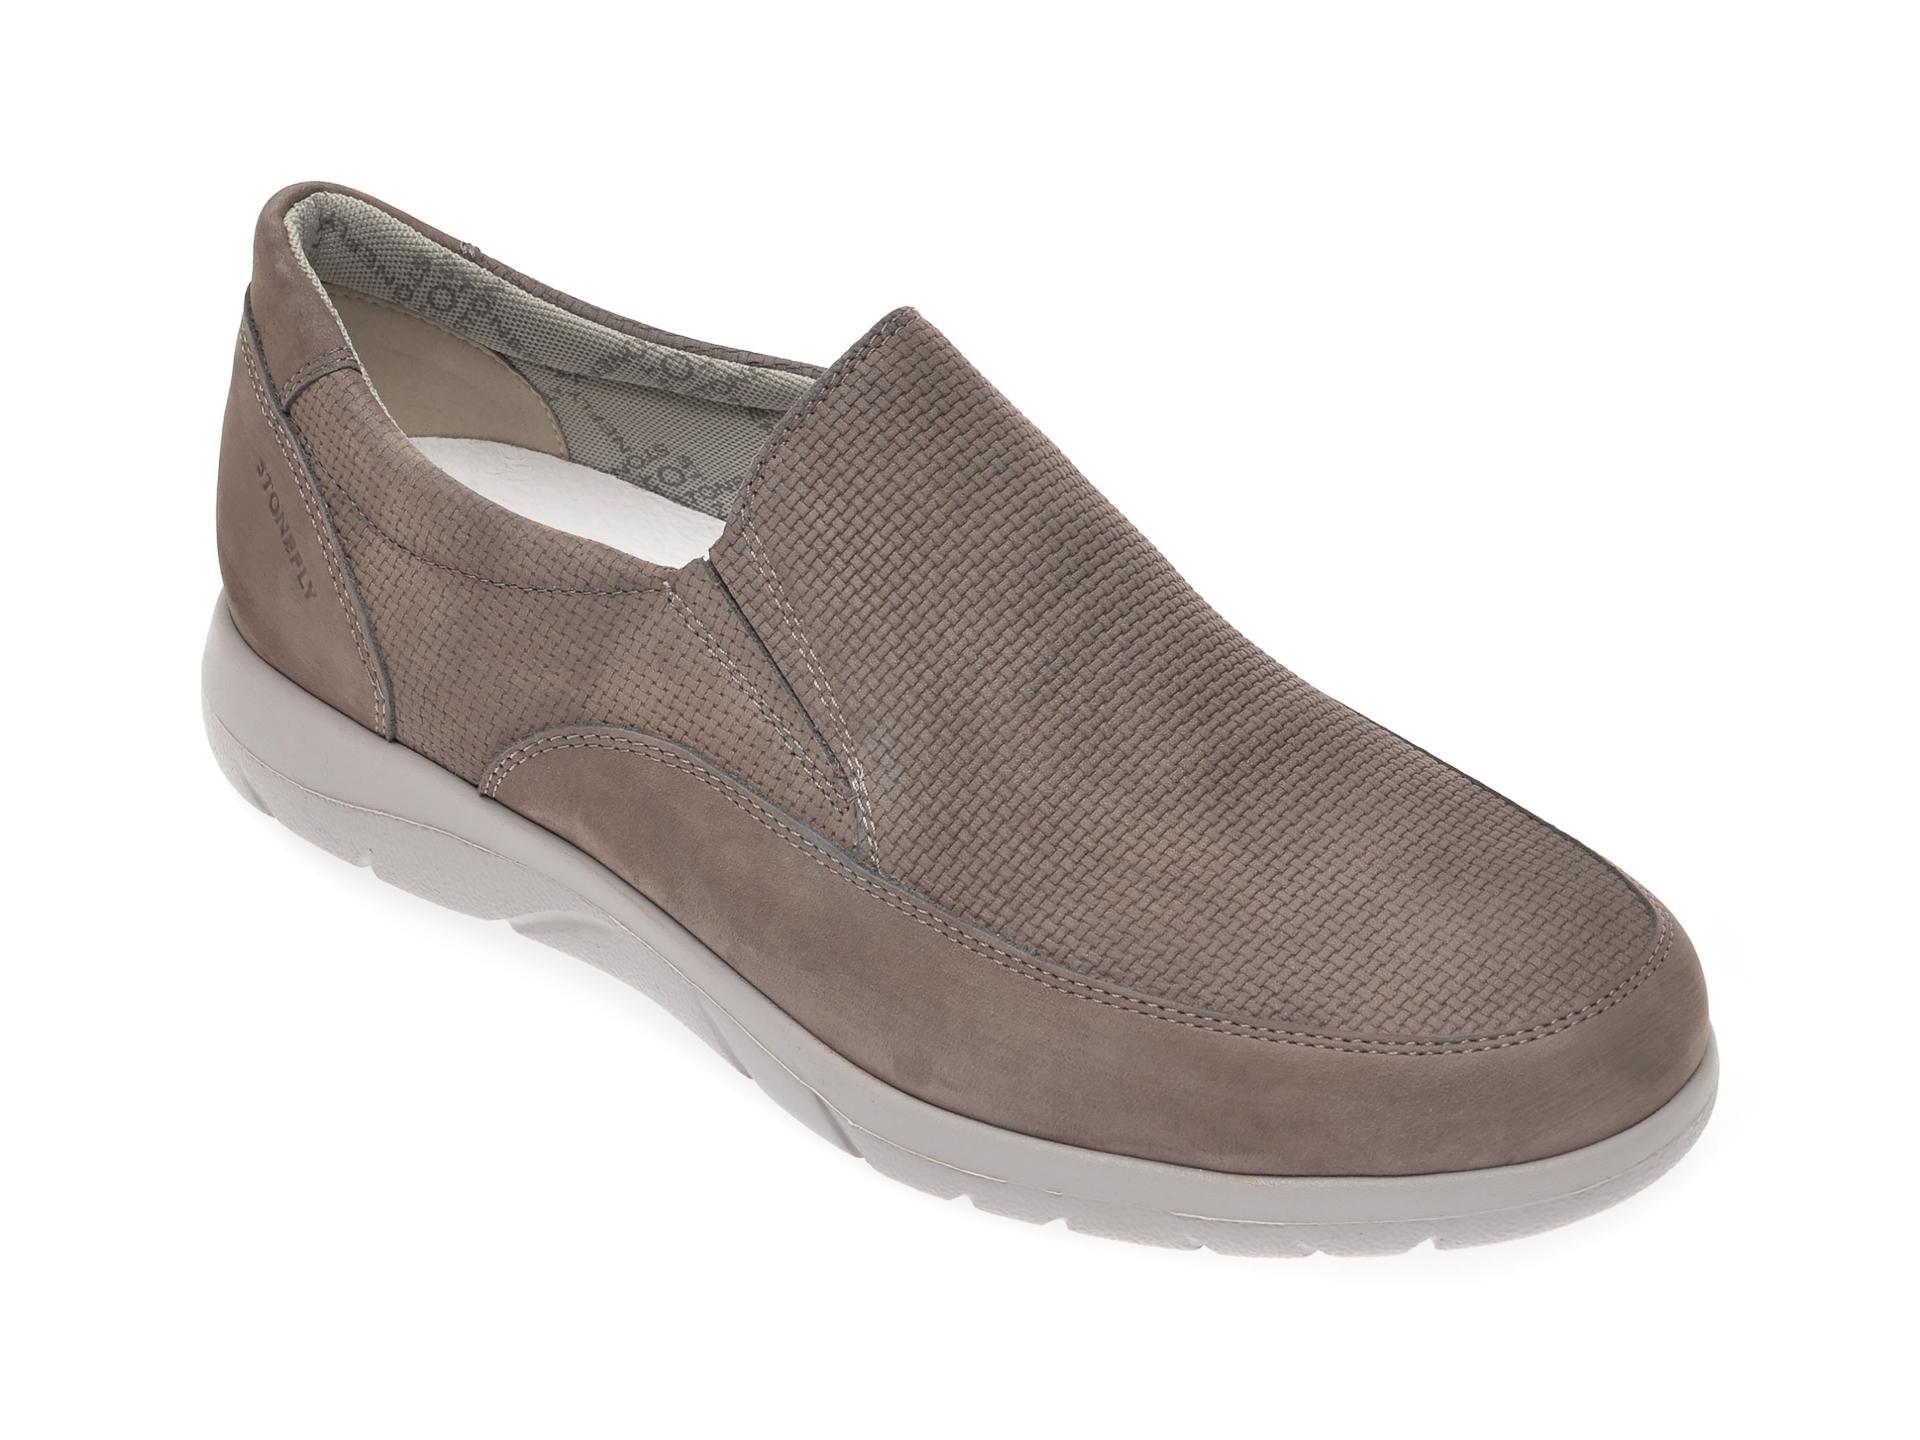 Pantofi STONEFLY gri, SPAMA26, din nabuc imagine